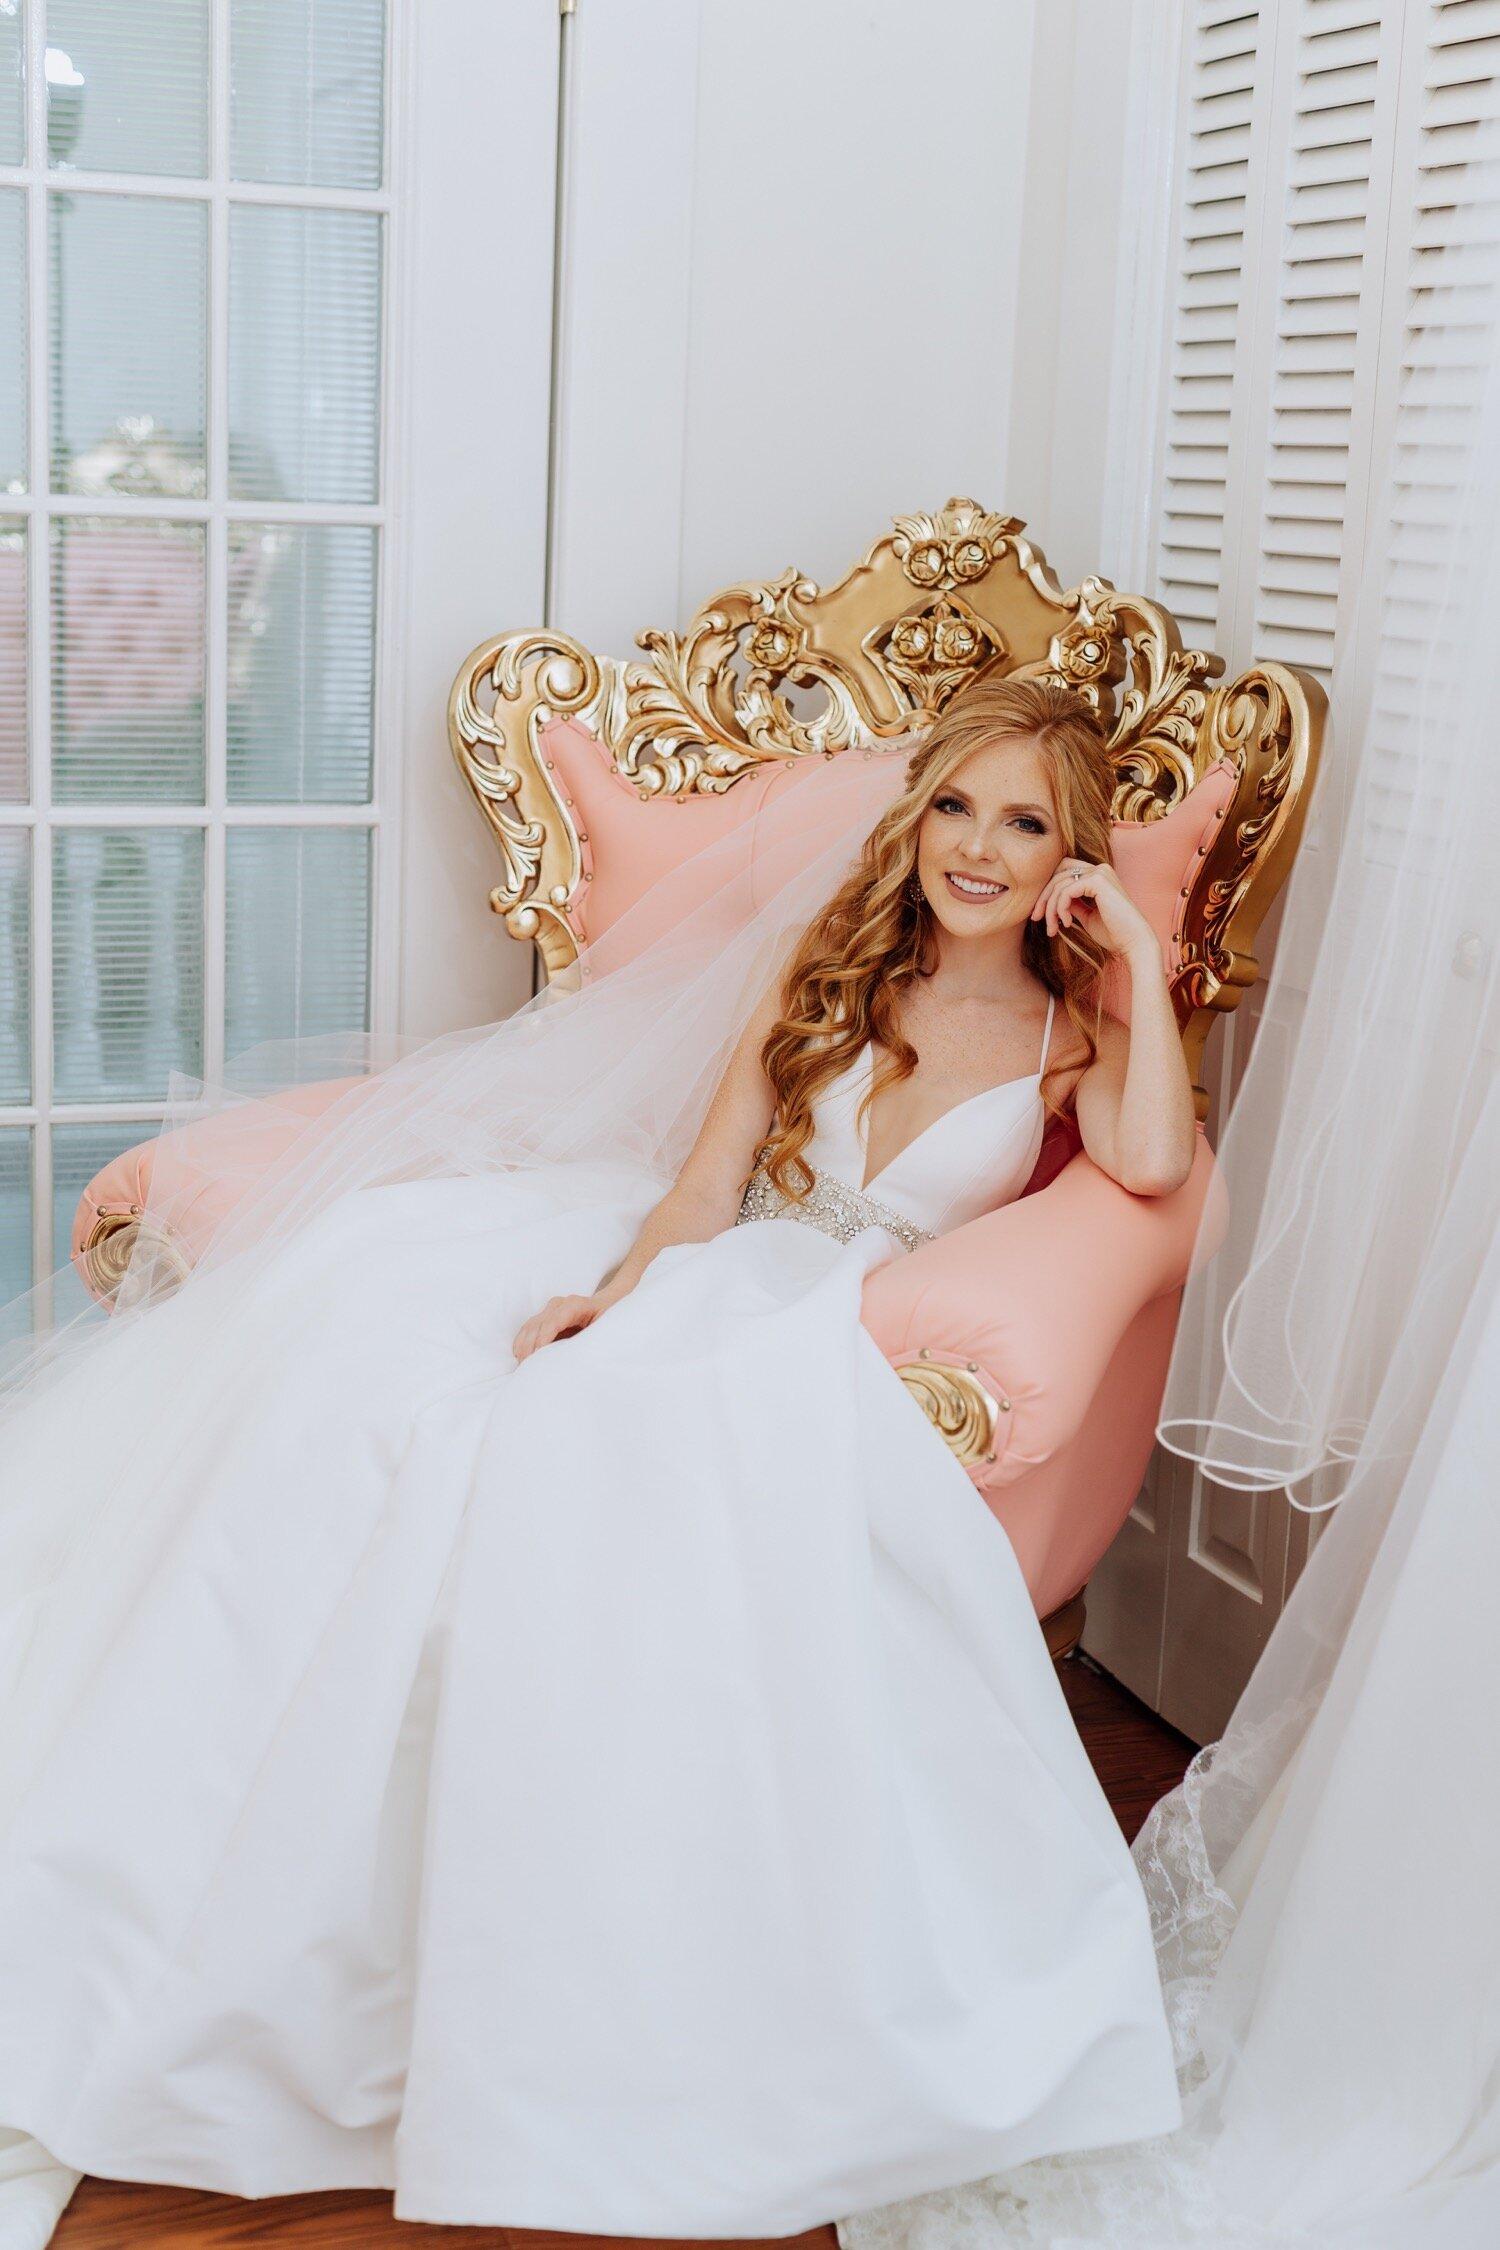 23_lifetolensphotography-113083_pink_secretgarden_session_bridals.jpg